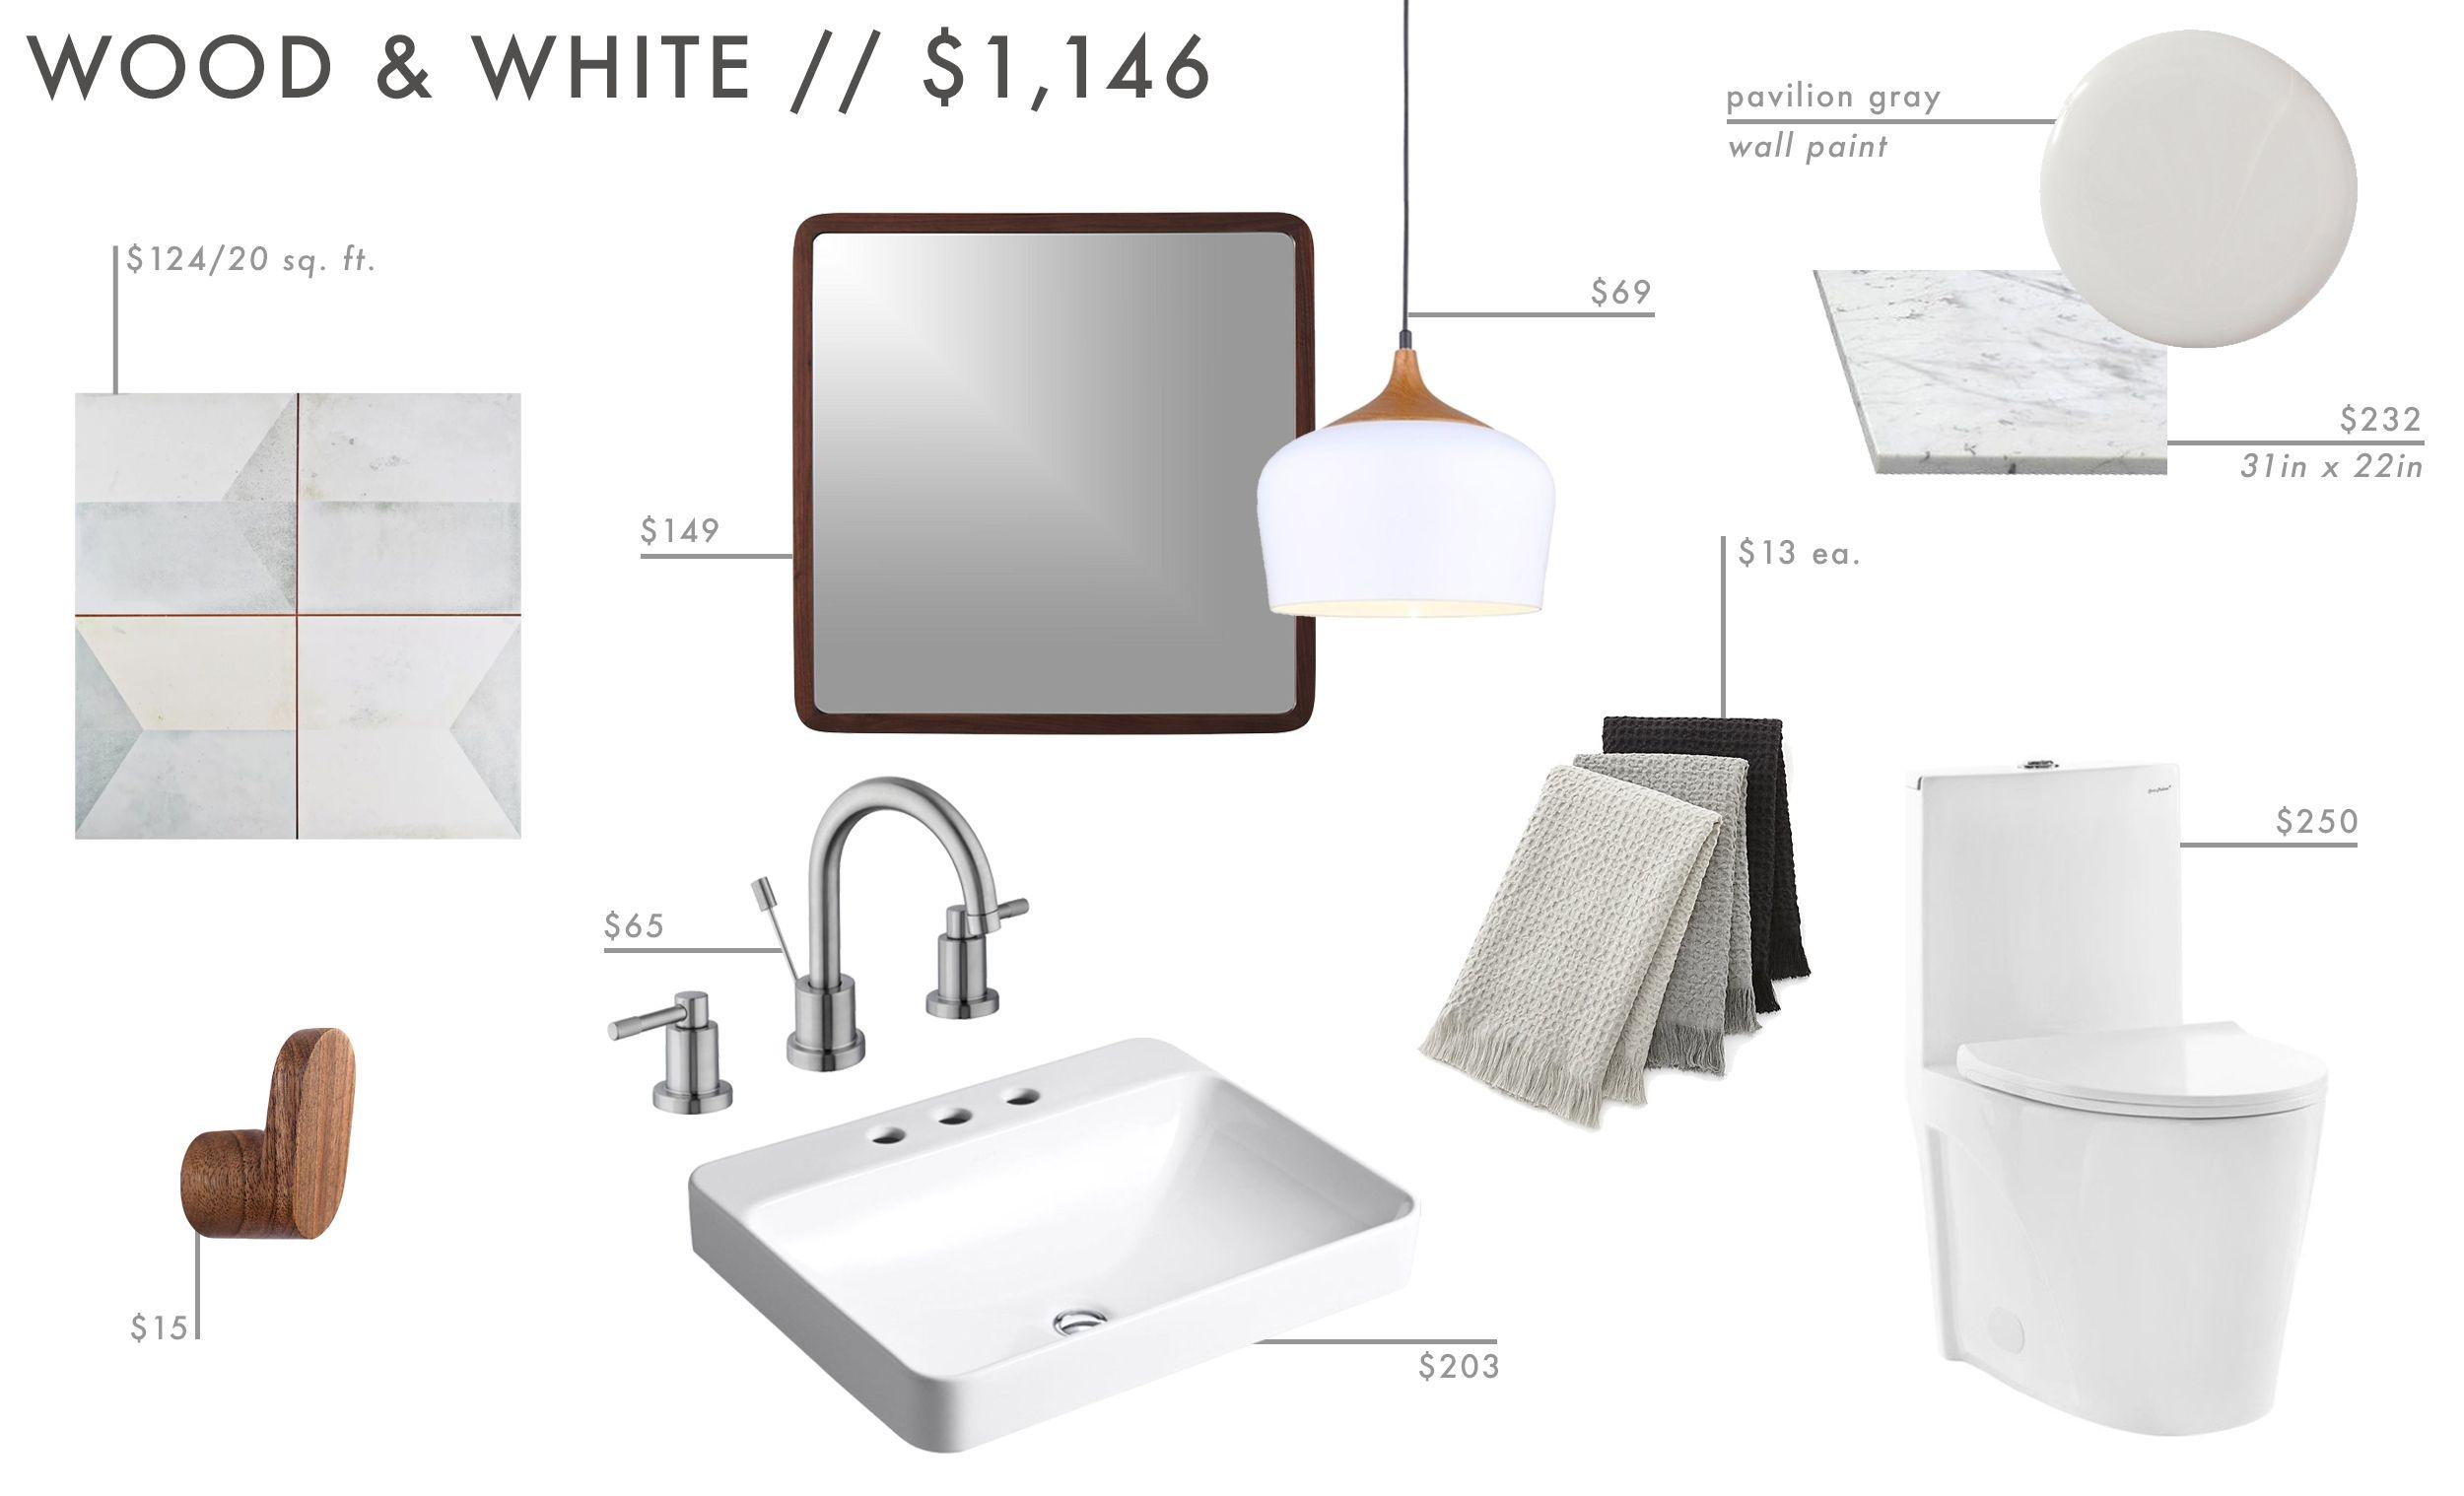 9 affordable budget powder room designs aka the 1 2 bath olive rh pinterest com